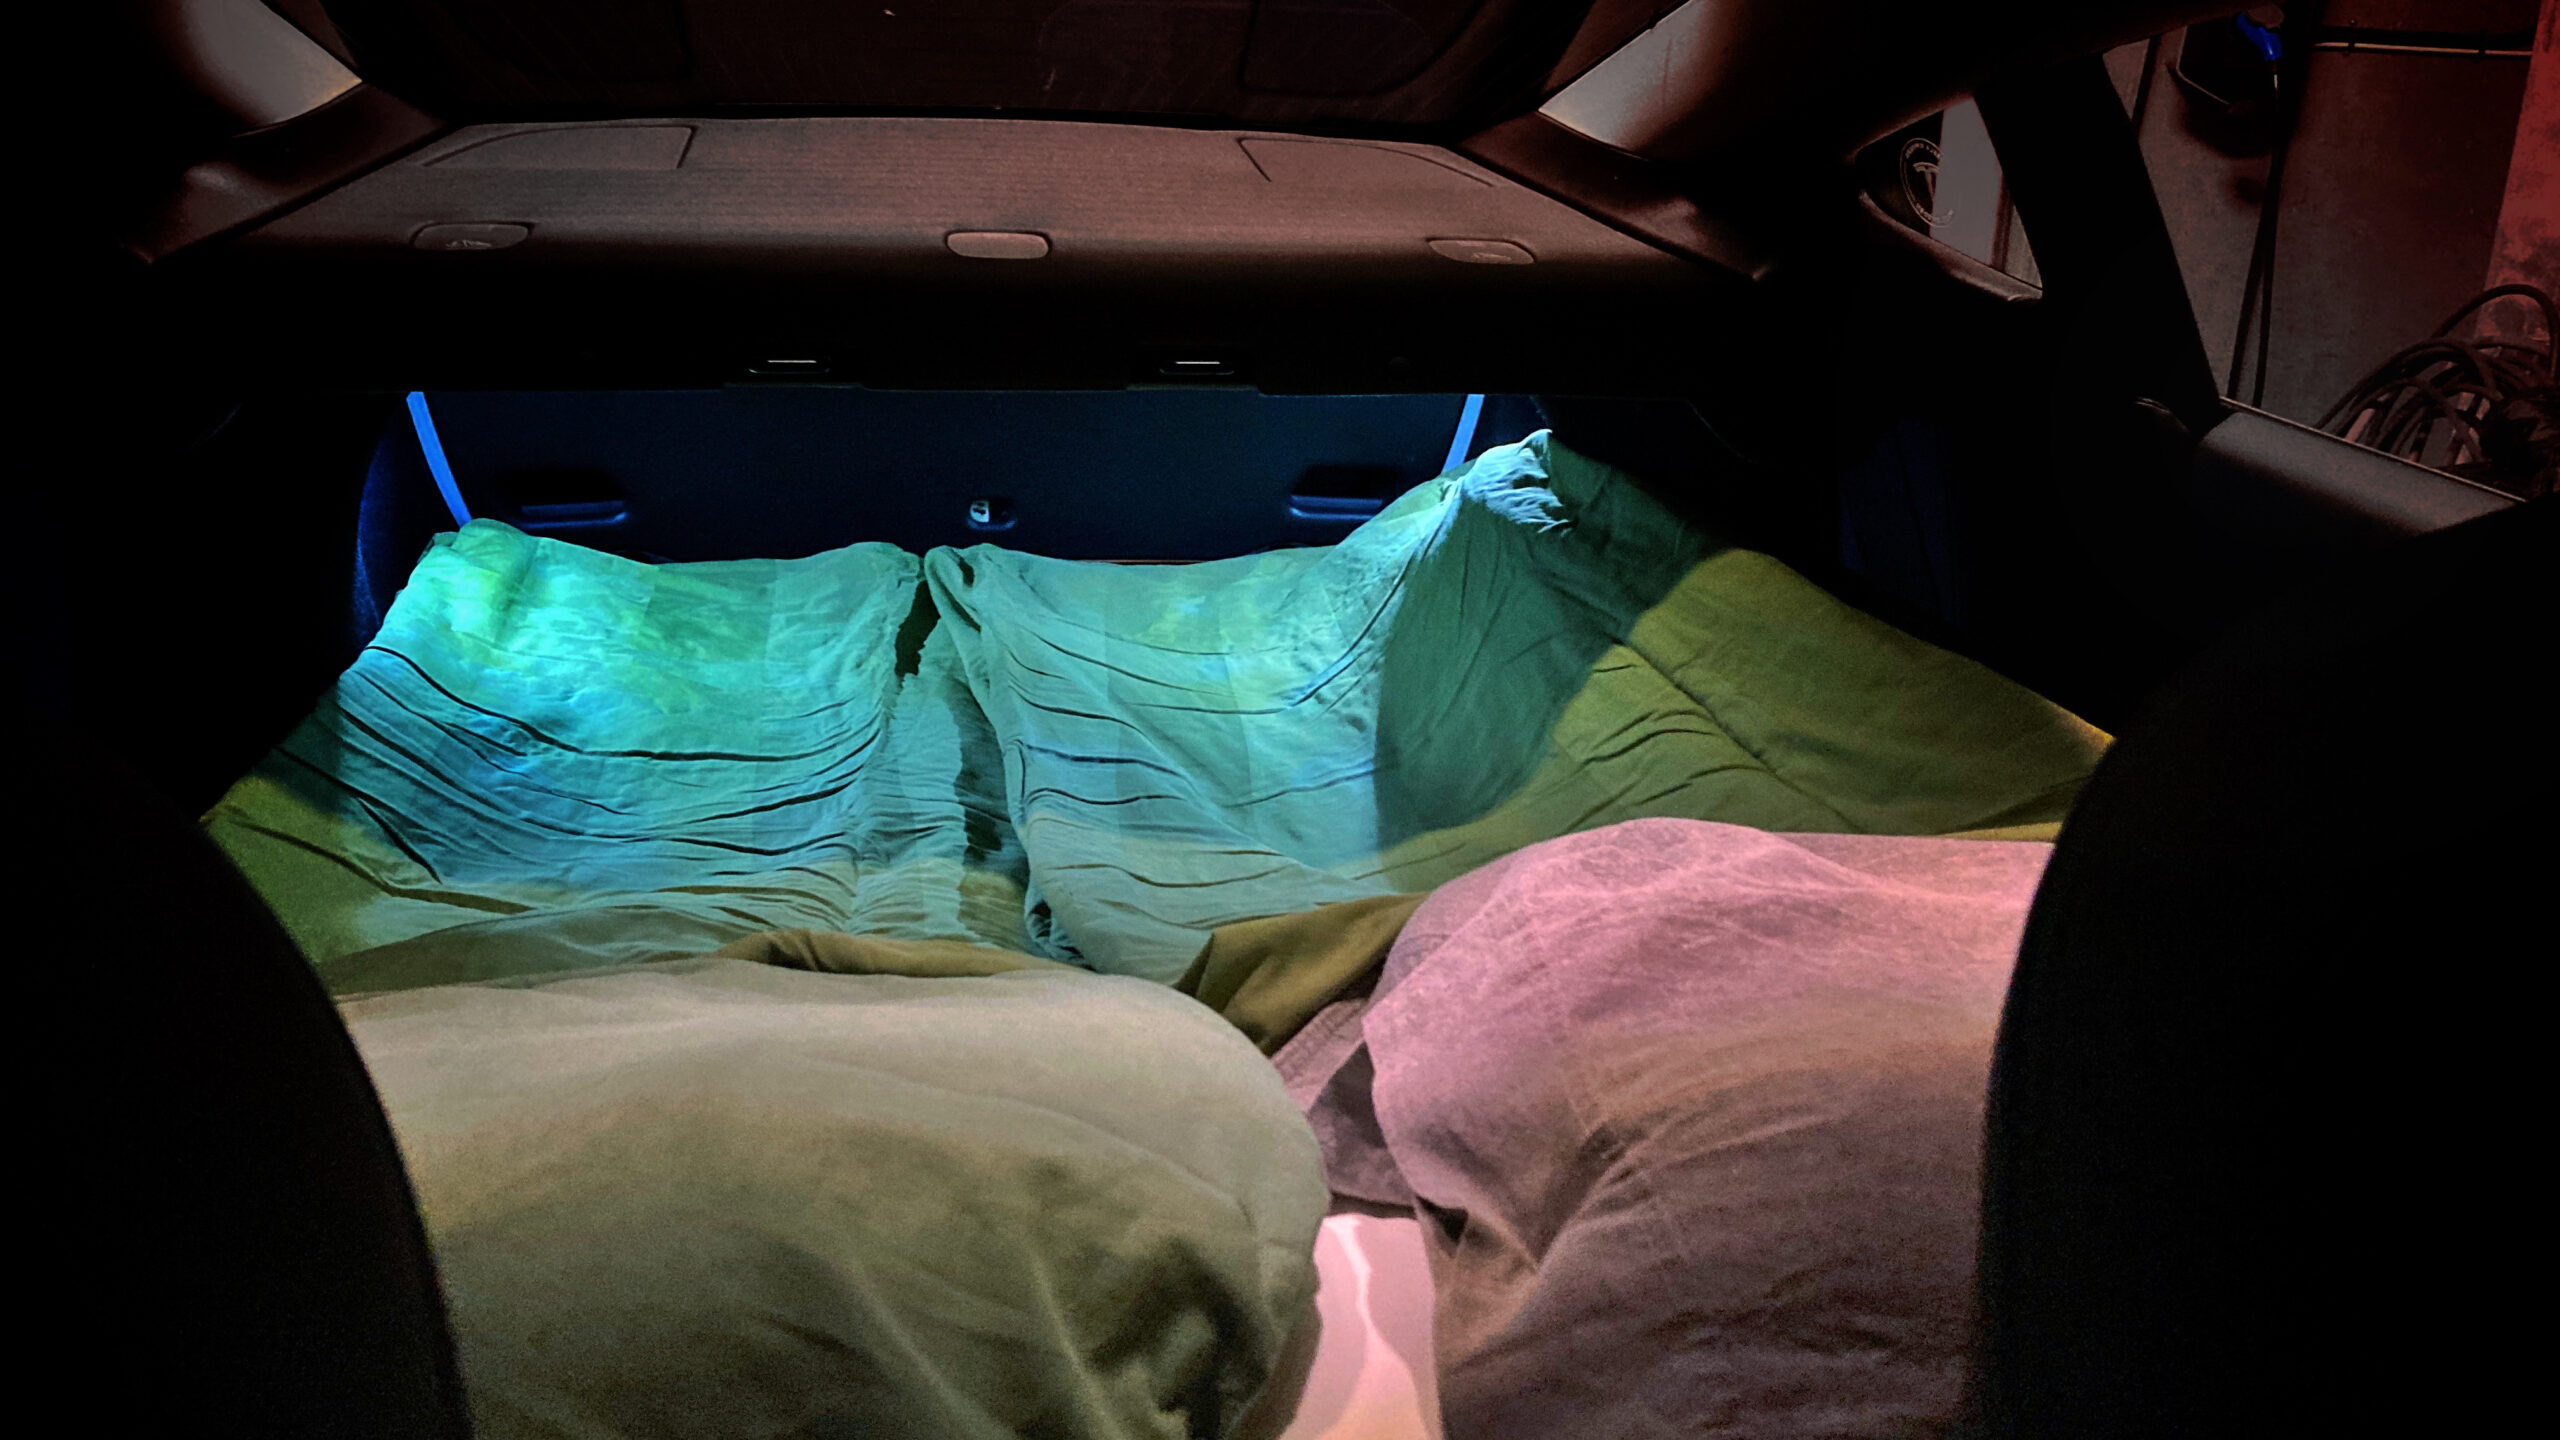 Plus F60 Dreamzone madrass i vår Tesla Model 3 sett innefrån bilen